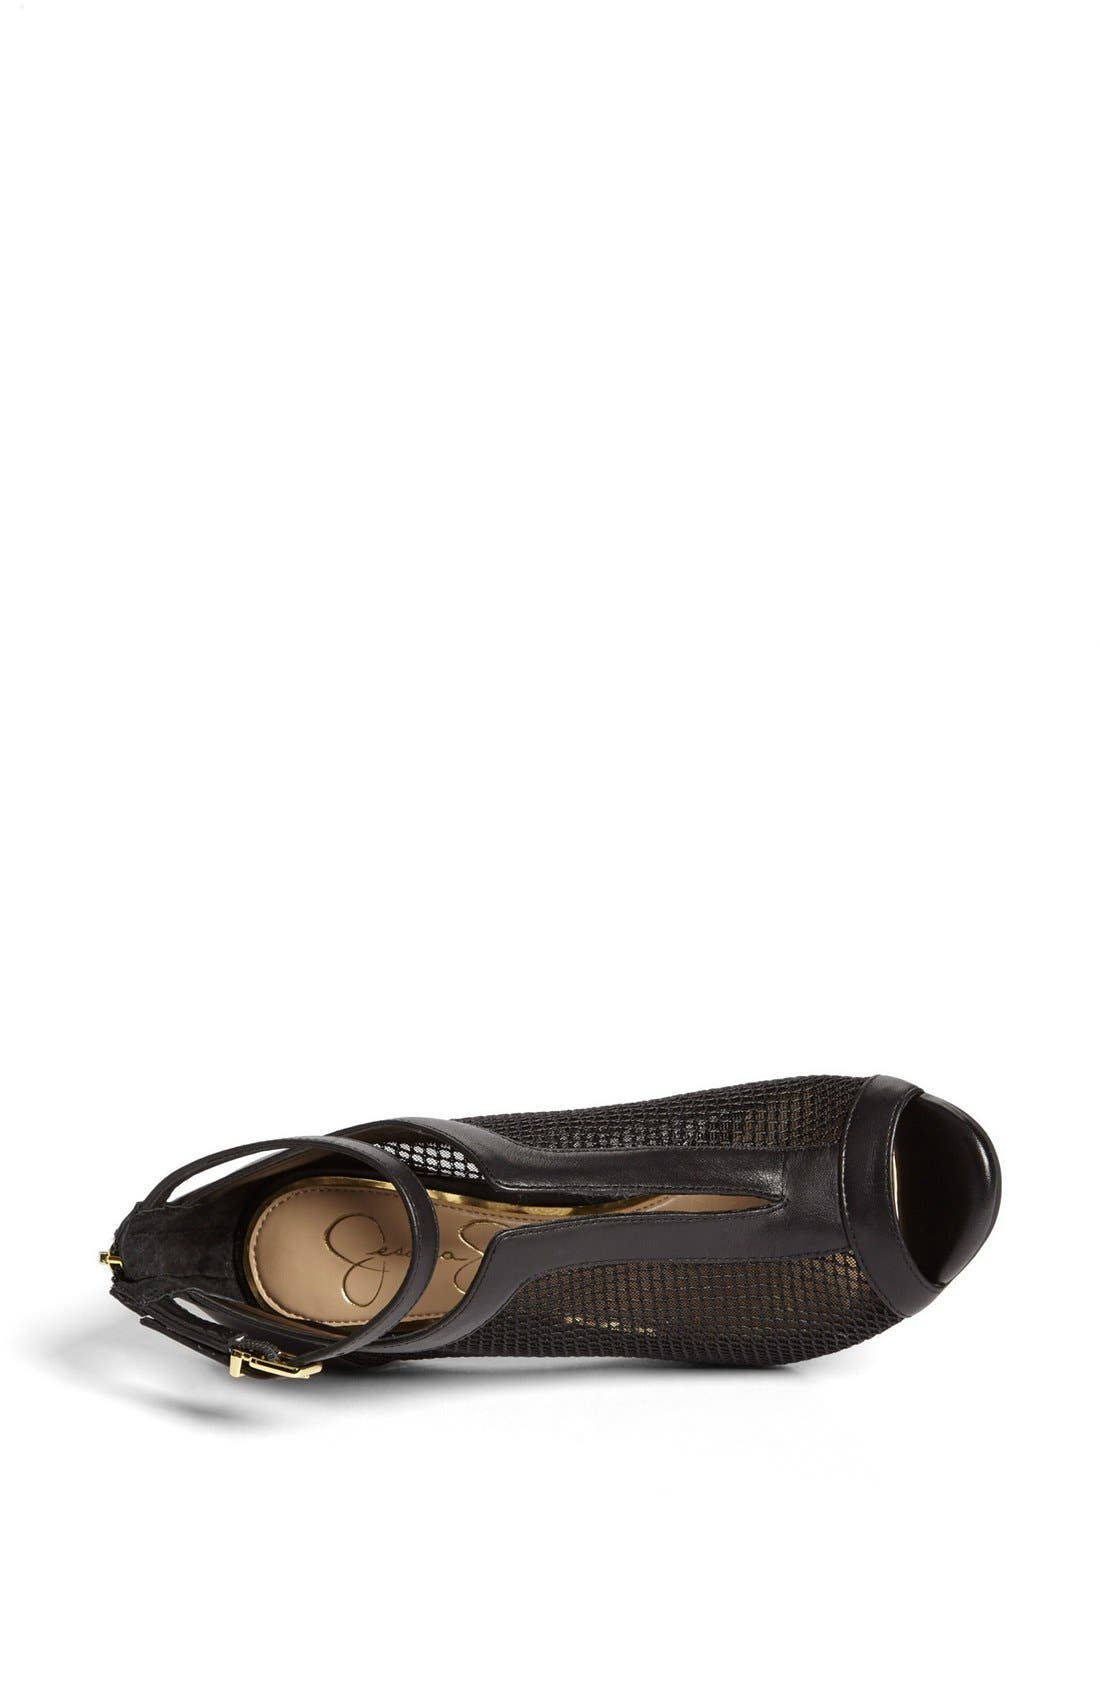 Alternate Image 3  - Jessica Simpson 'Rossii' Ankle Strap Shootie